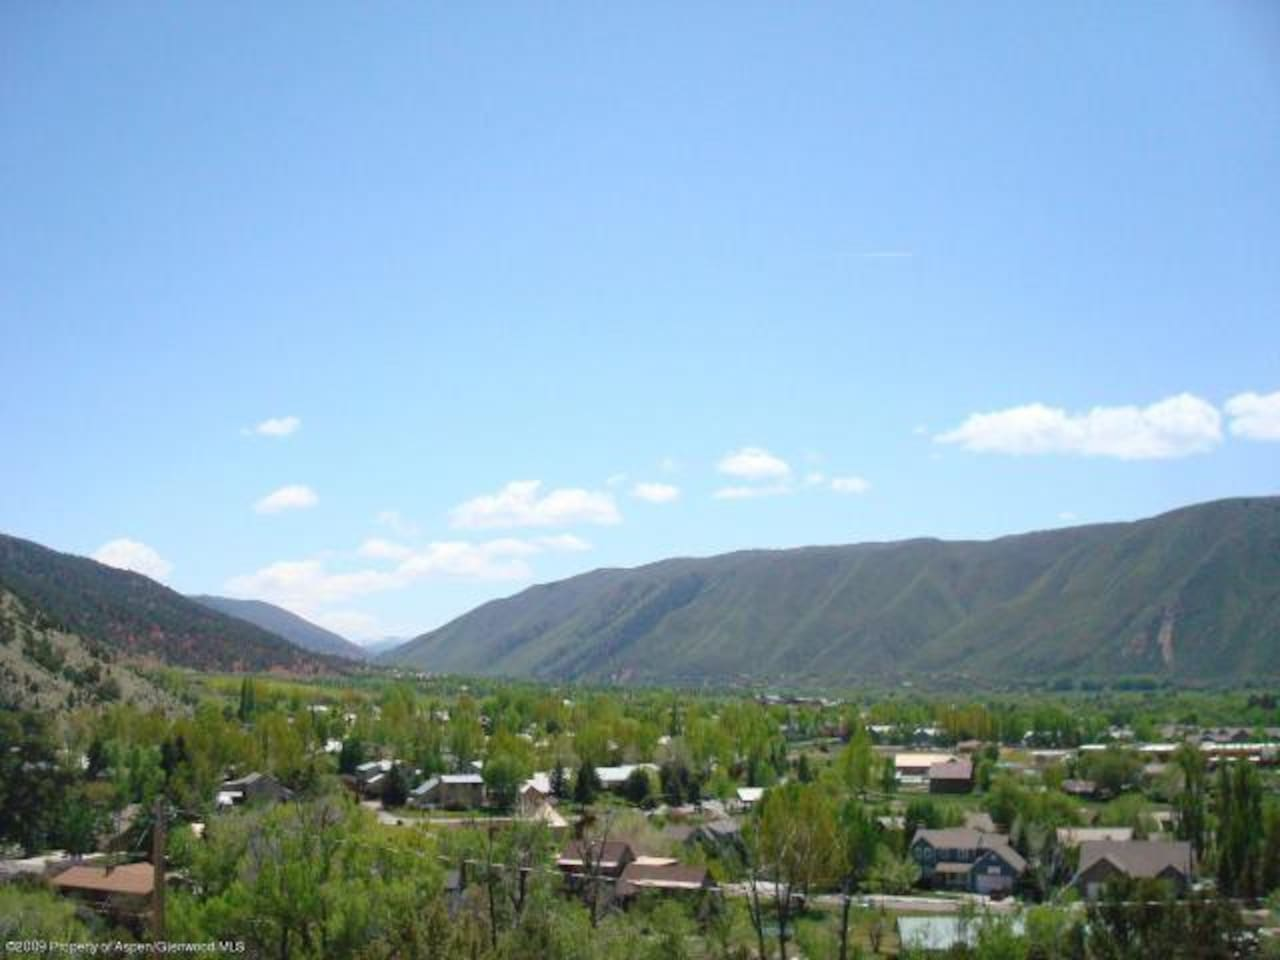 View of Basalt neighborhood, Roaring Fork Club to Aspen Mountain